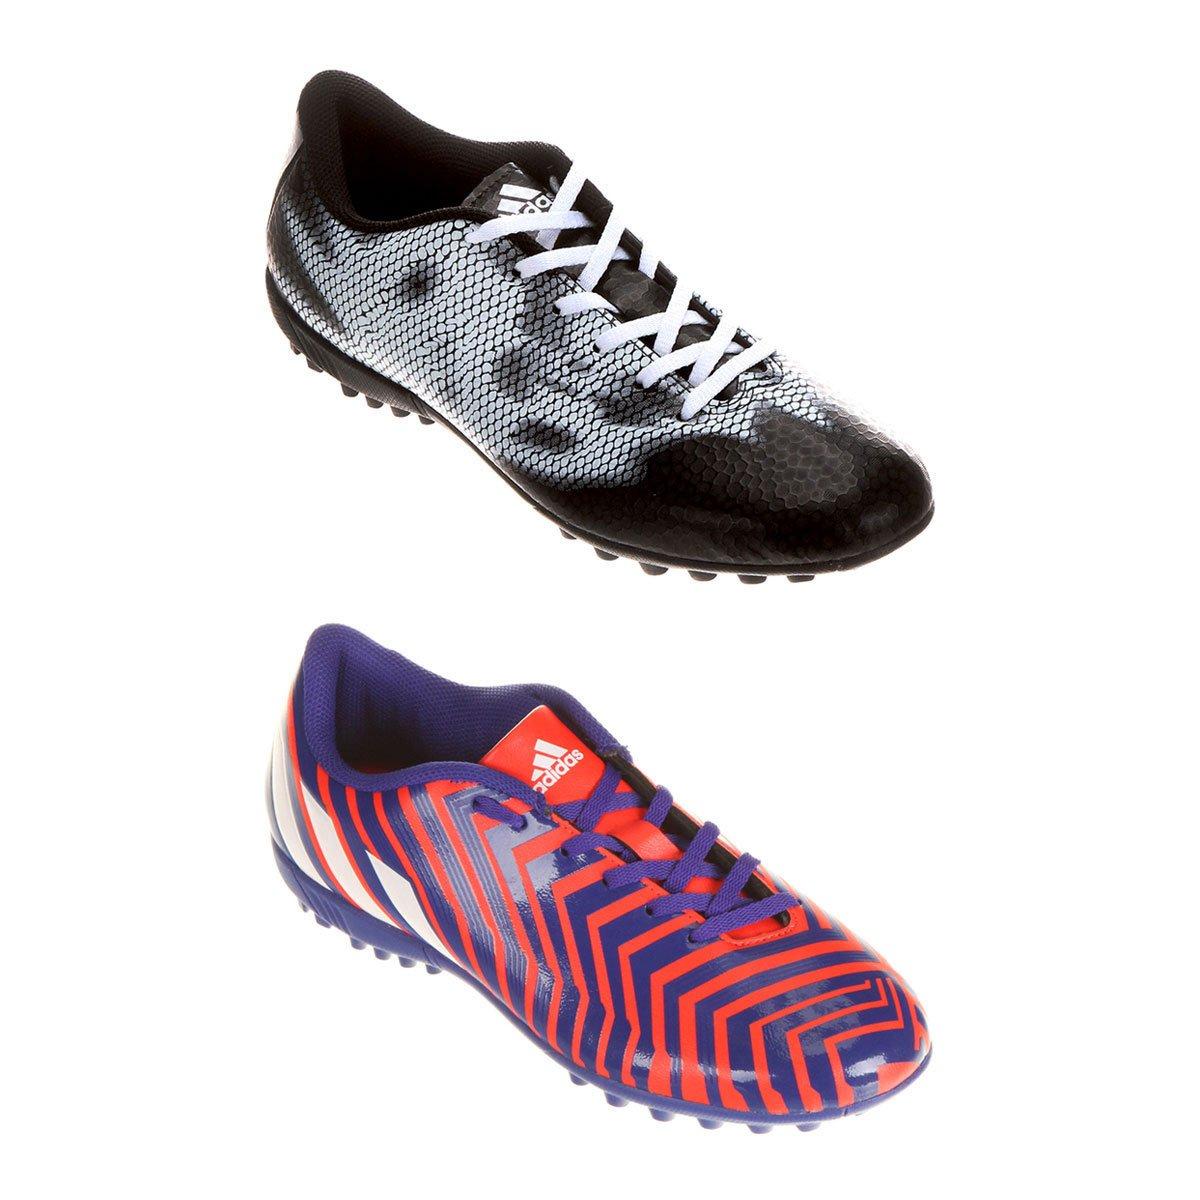 1442e7ec45 Kit Chuteira Adidas Predito Instinct TF Society + Chuteira Adidas F5 TF  Society - Compre Agora